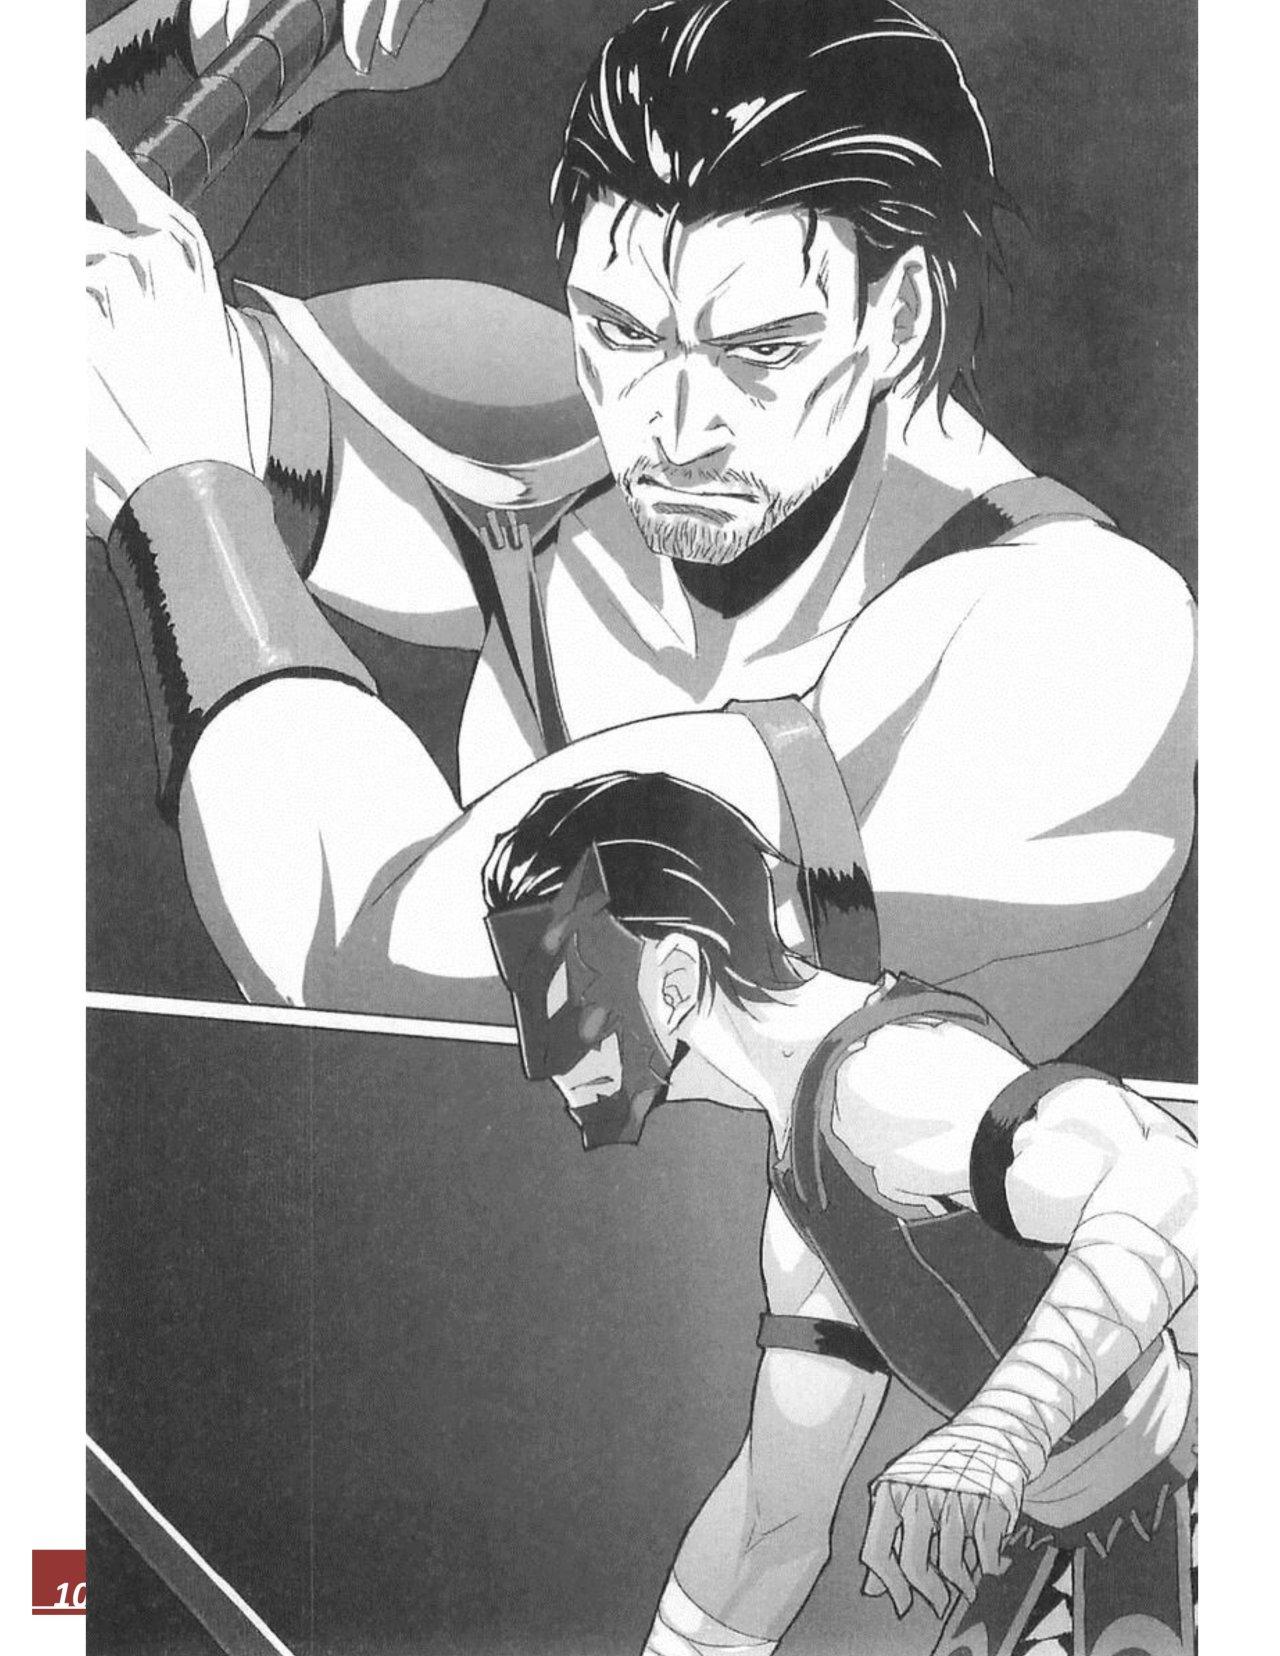 https://c9.mangatag.com/es_manga/pic5/22/25558/717675/533aa9666119d578b635c3bdba609070.jpg Page 10